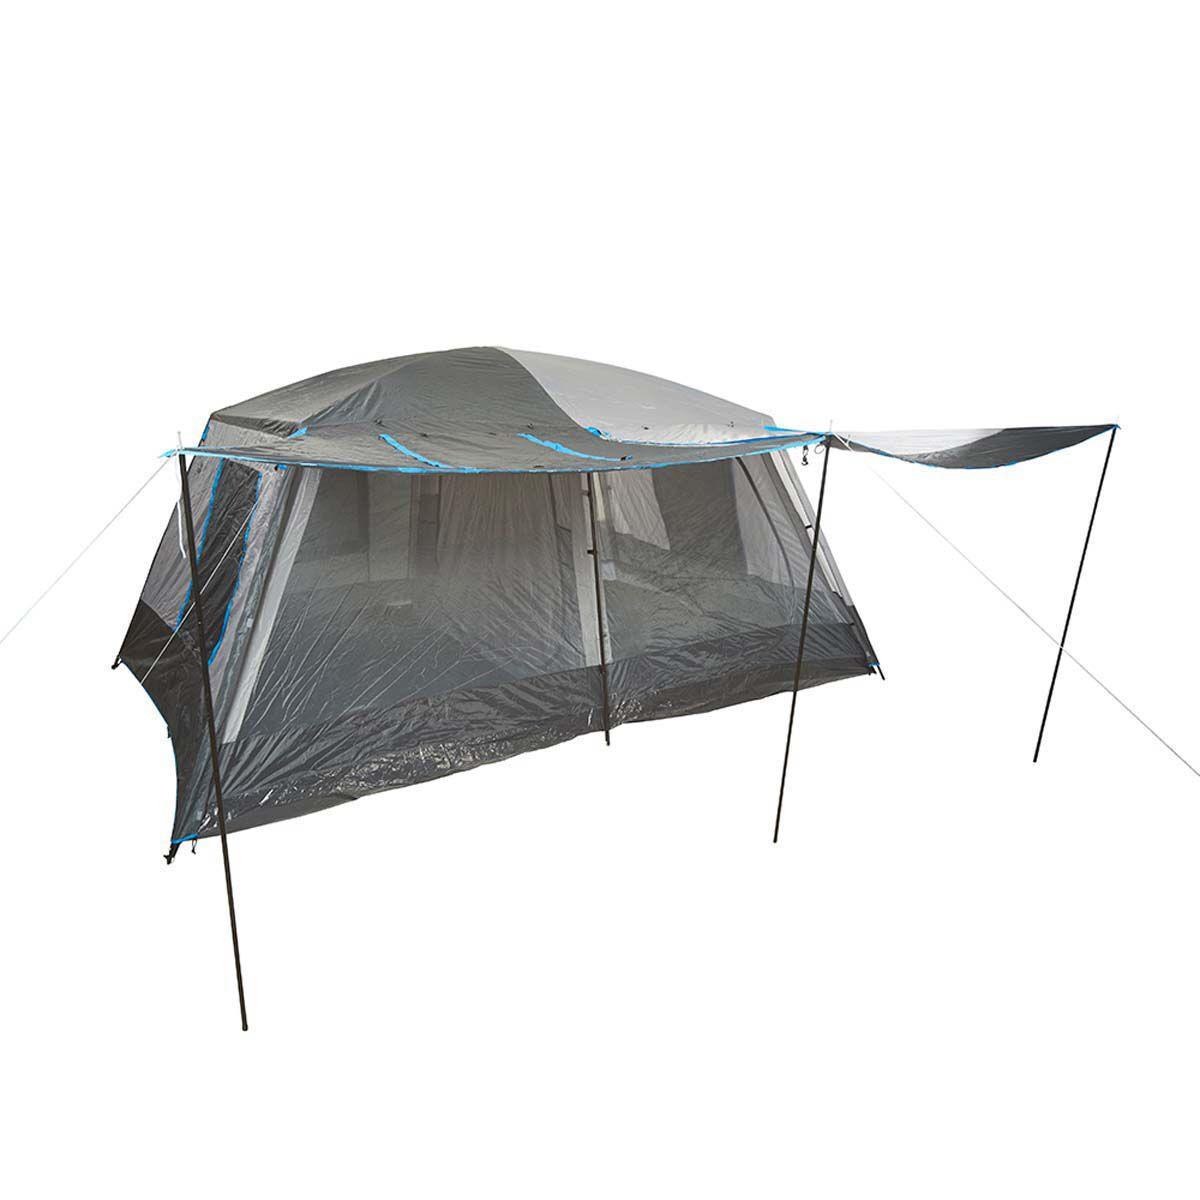 ... Wanderer Goliath II Dome Tent 10 Person  bcf_hi-res  sc 1 st  BCF Australia & Dome Tents - Buy Online - BCF Australia